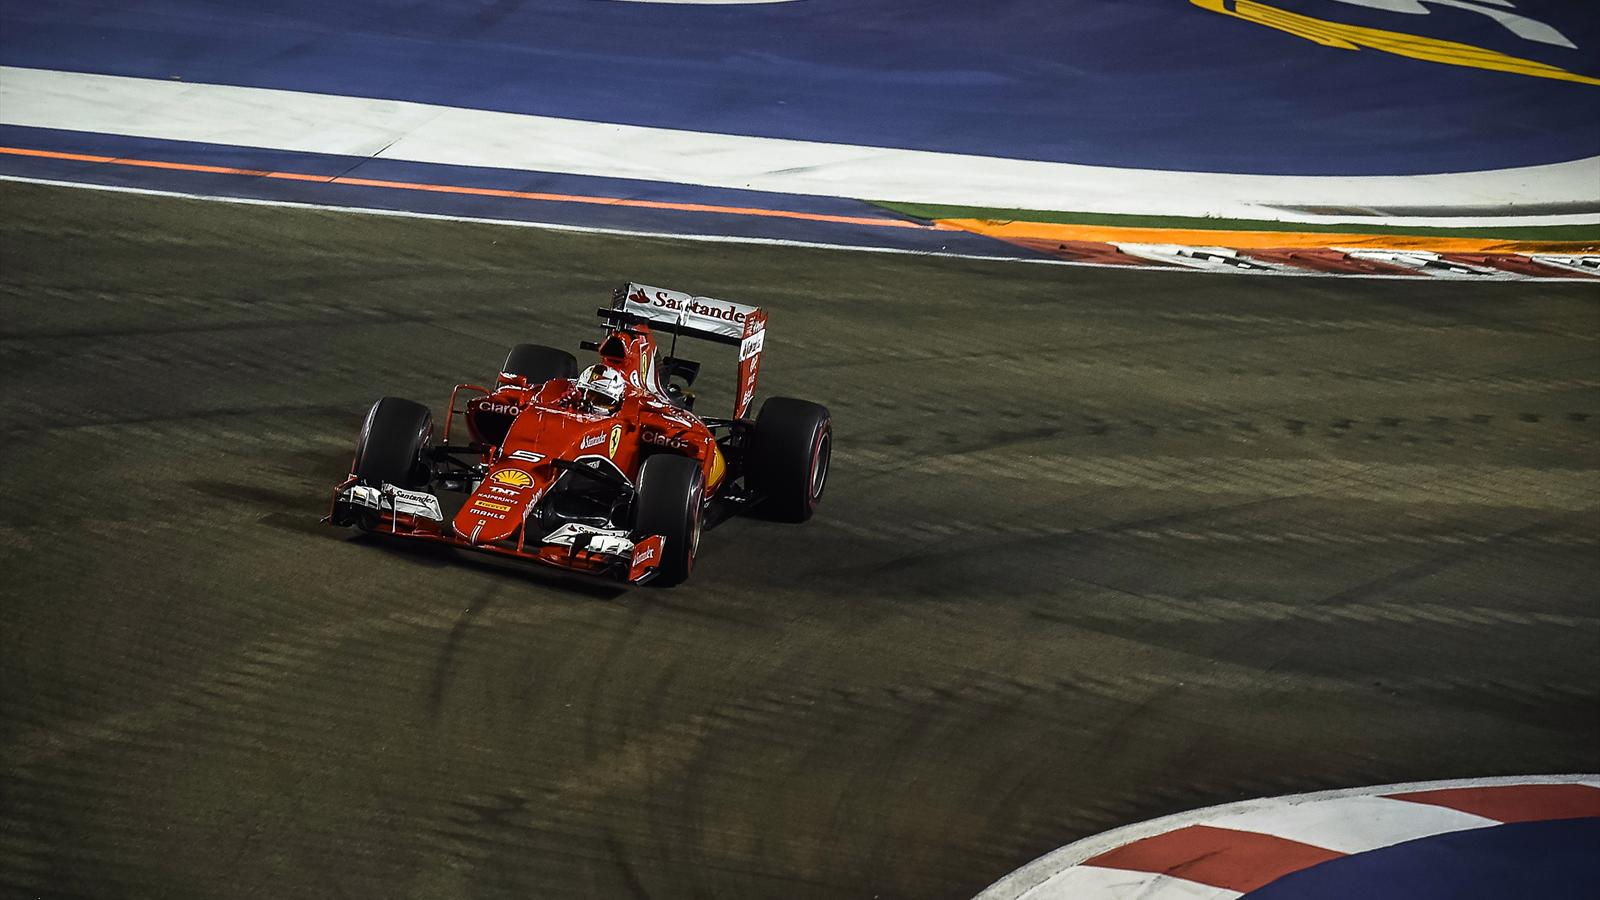 Ferrari's German driver Sebastian Vettel powers his car during the Formula One Singapore Grand Prix in Singapore on September 20, 2015